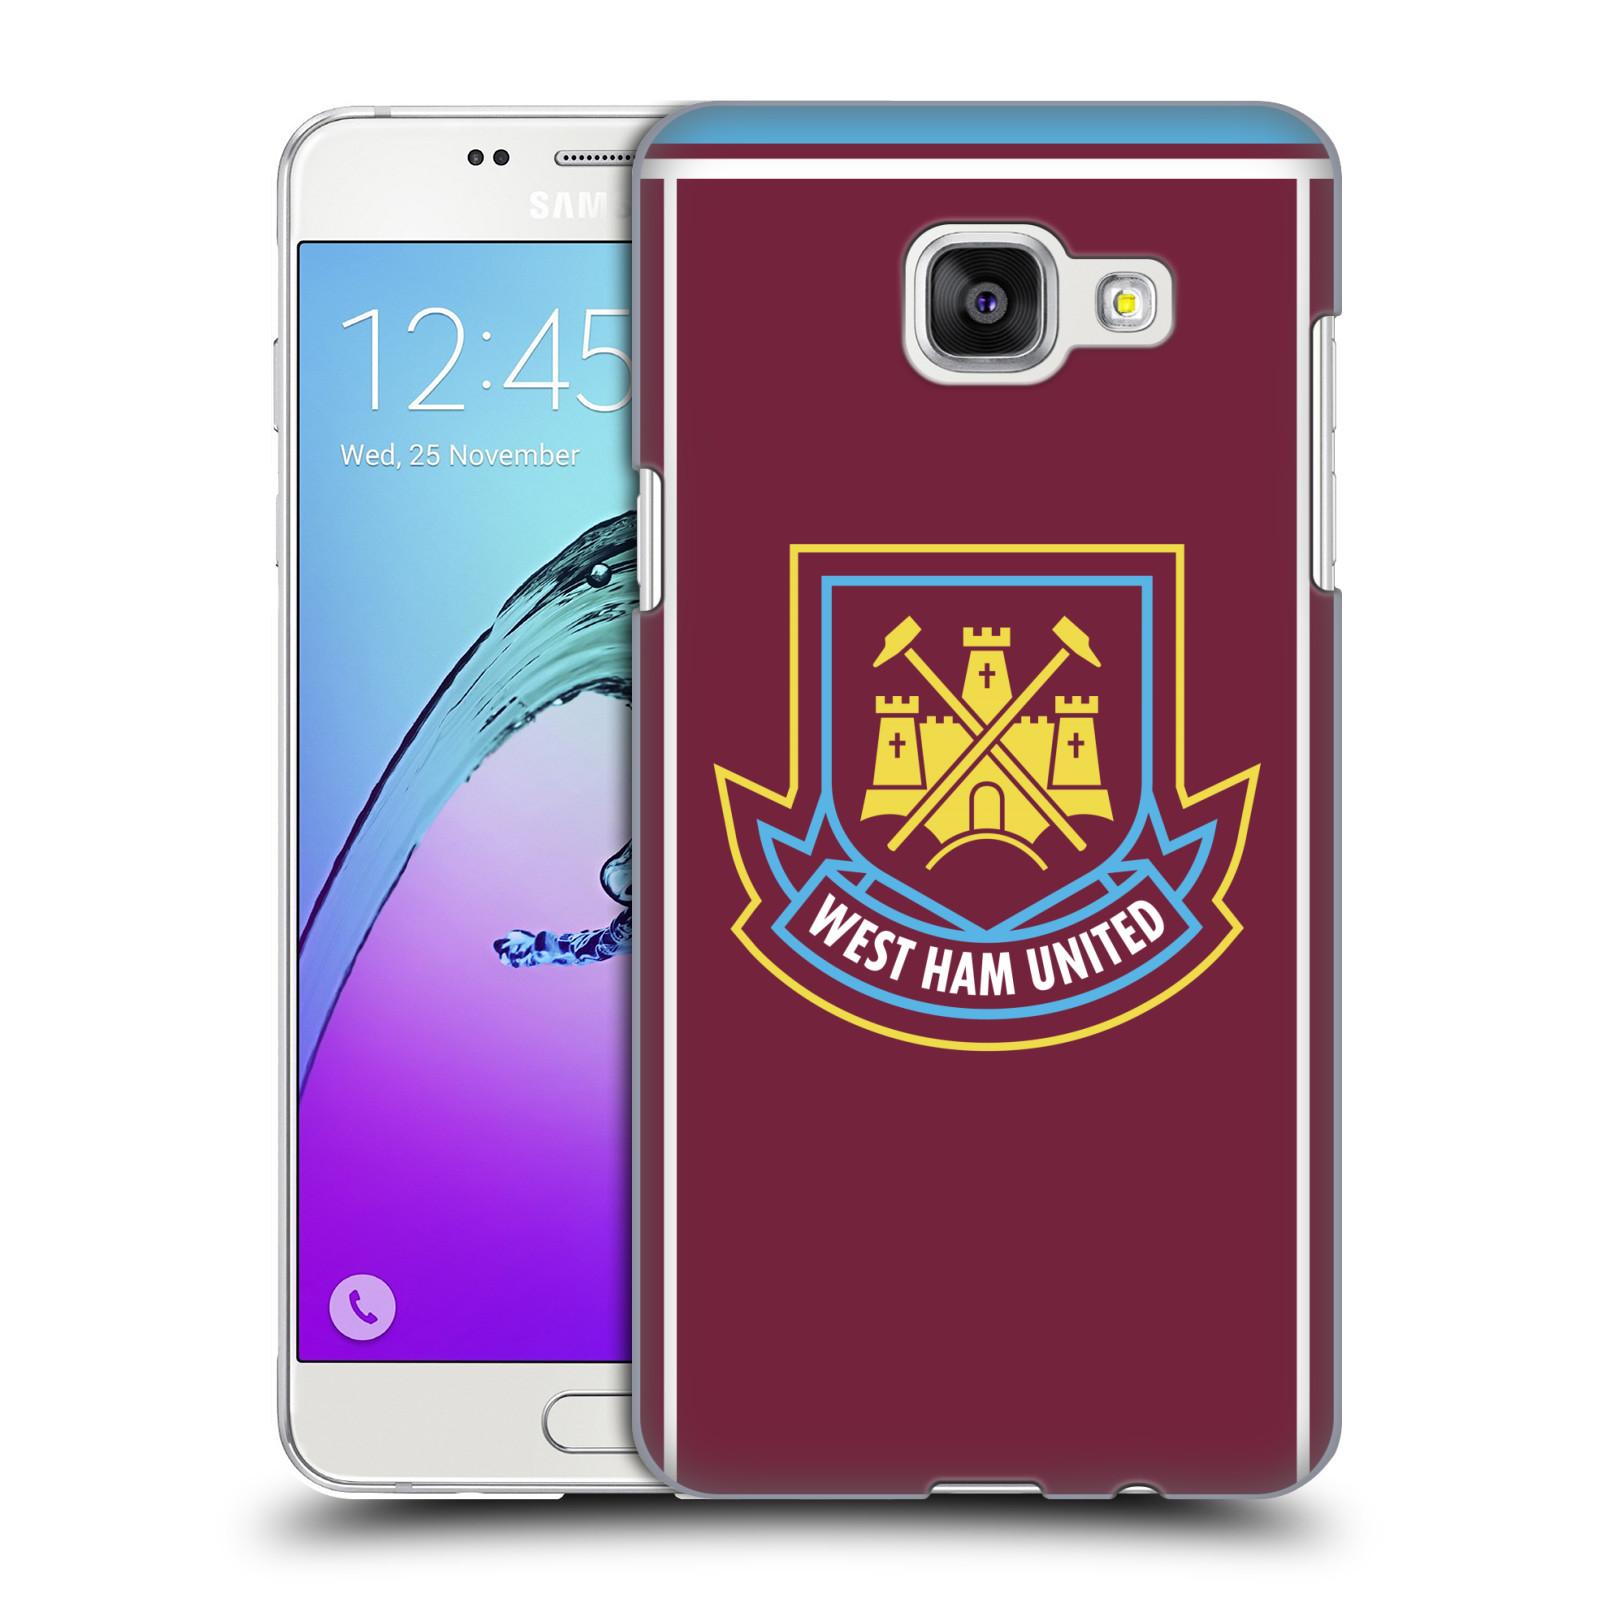 Plastové pouzdro na mobil Samsung Galaxy A5 (2016) - Head Case - West Ham United - Retro znak